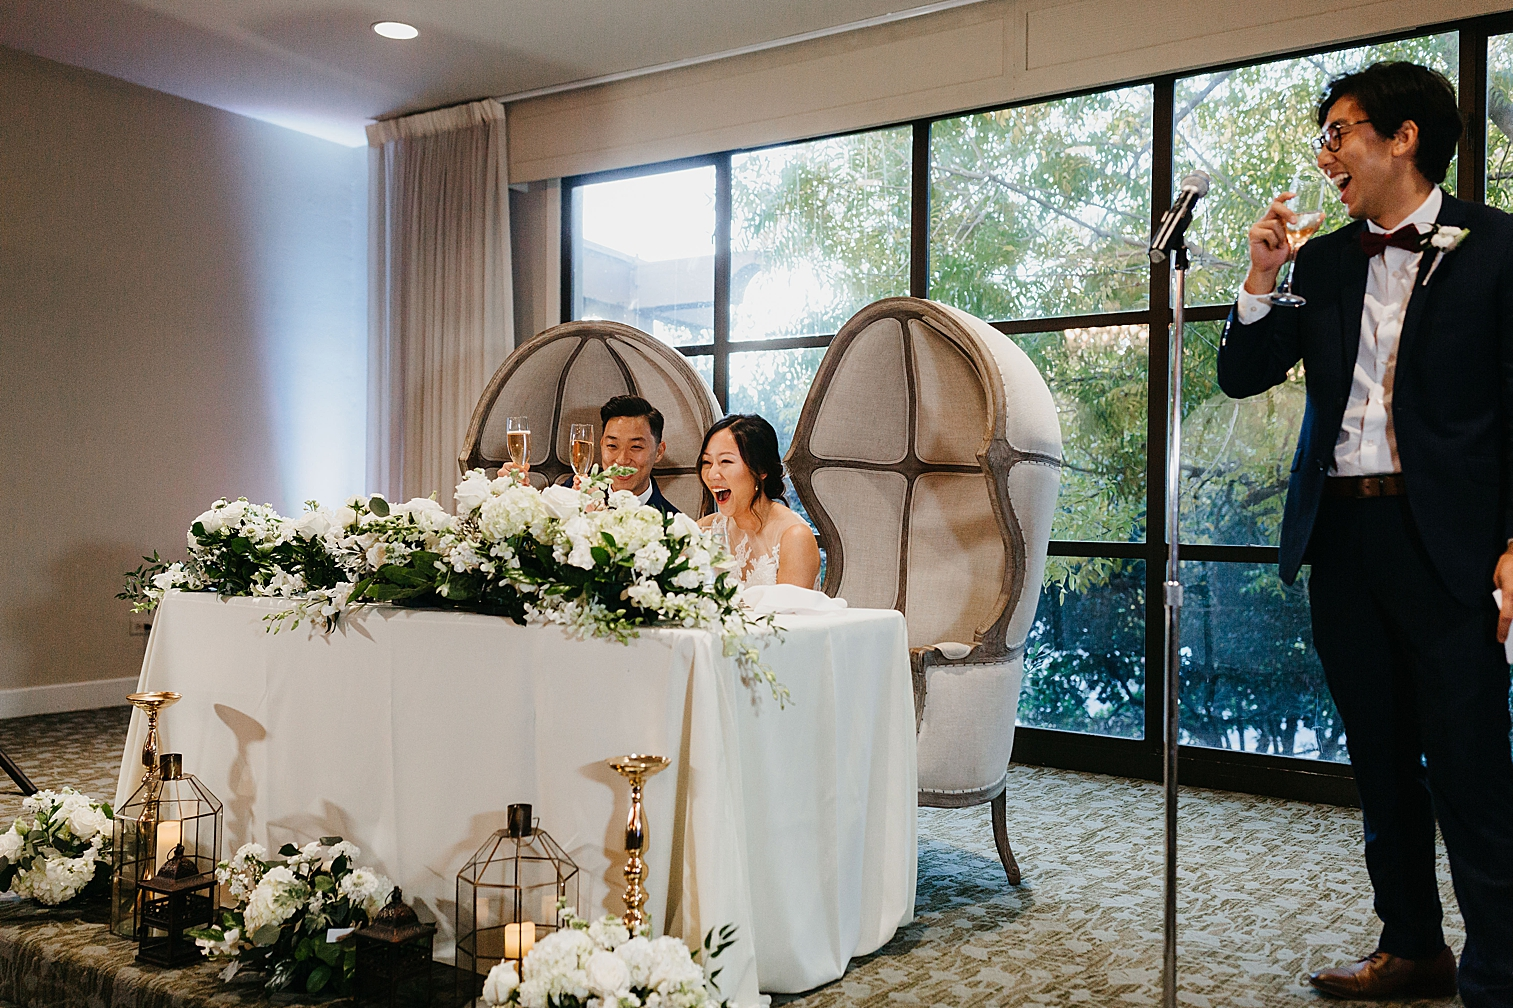 Secret-Garden-Rancho-Santa-Fe-Wedding-119.jpg